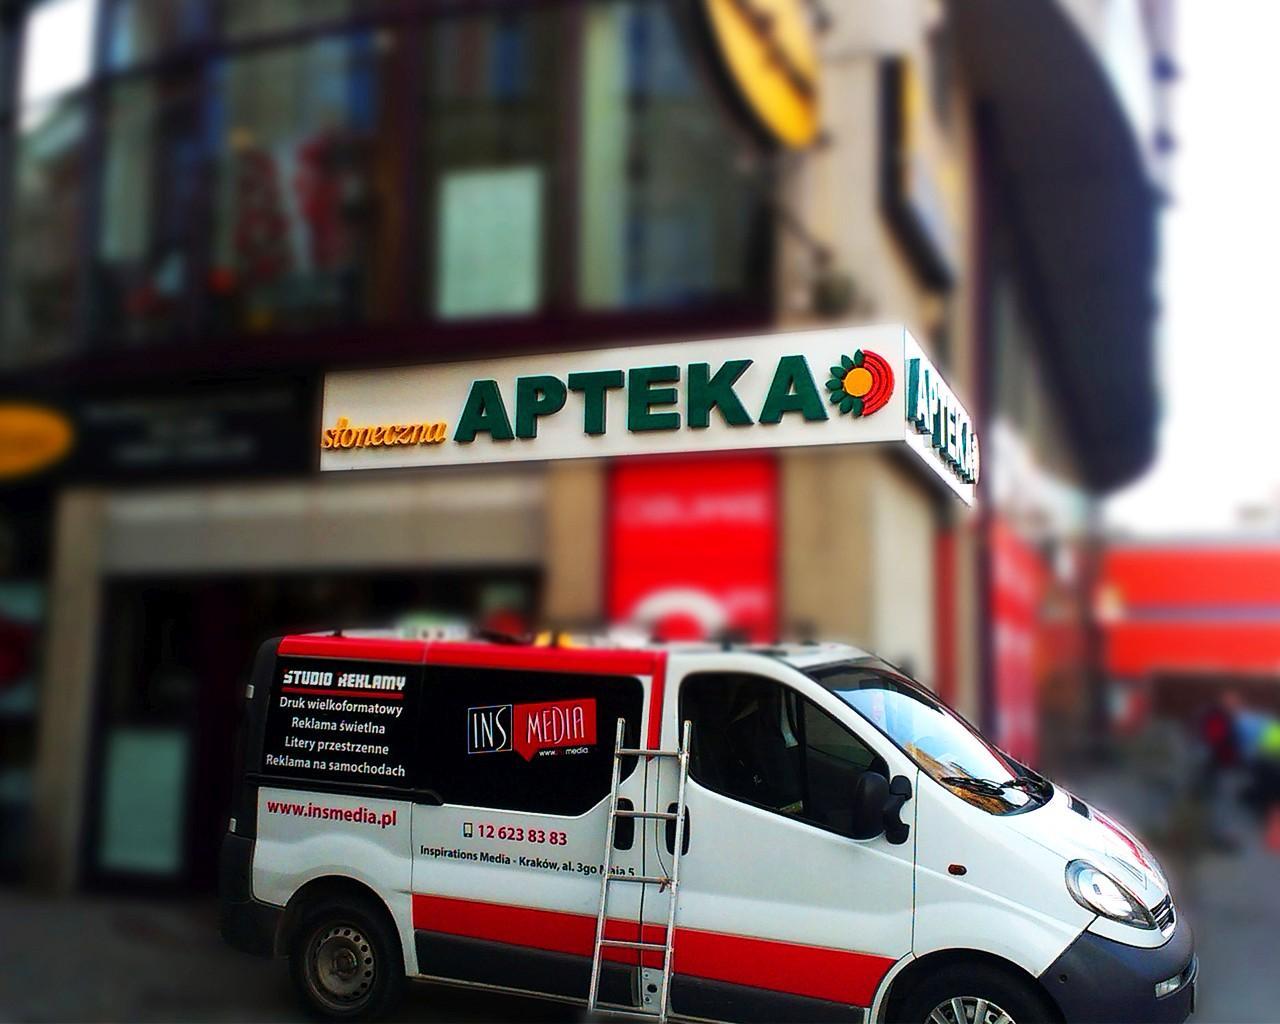 APTEKA_SLONECZNA_1